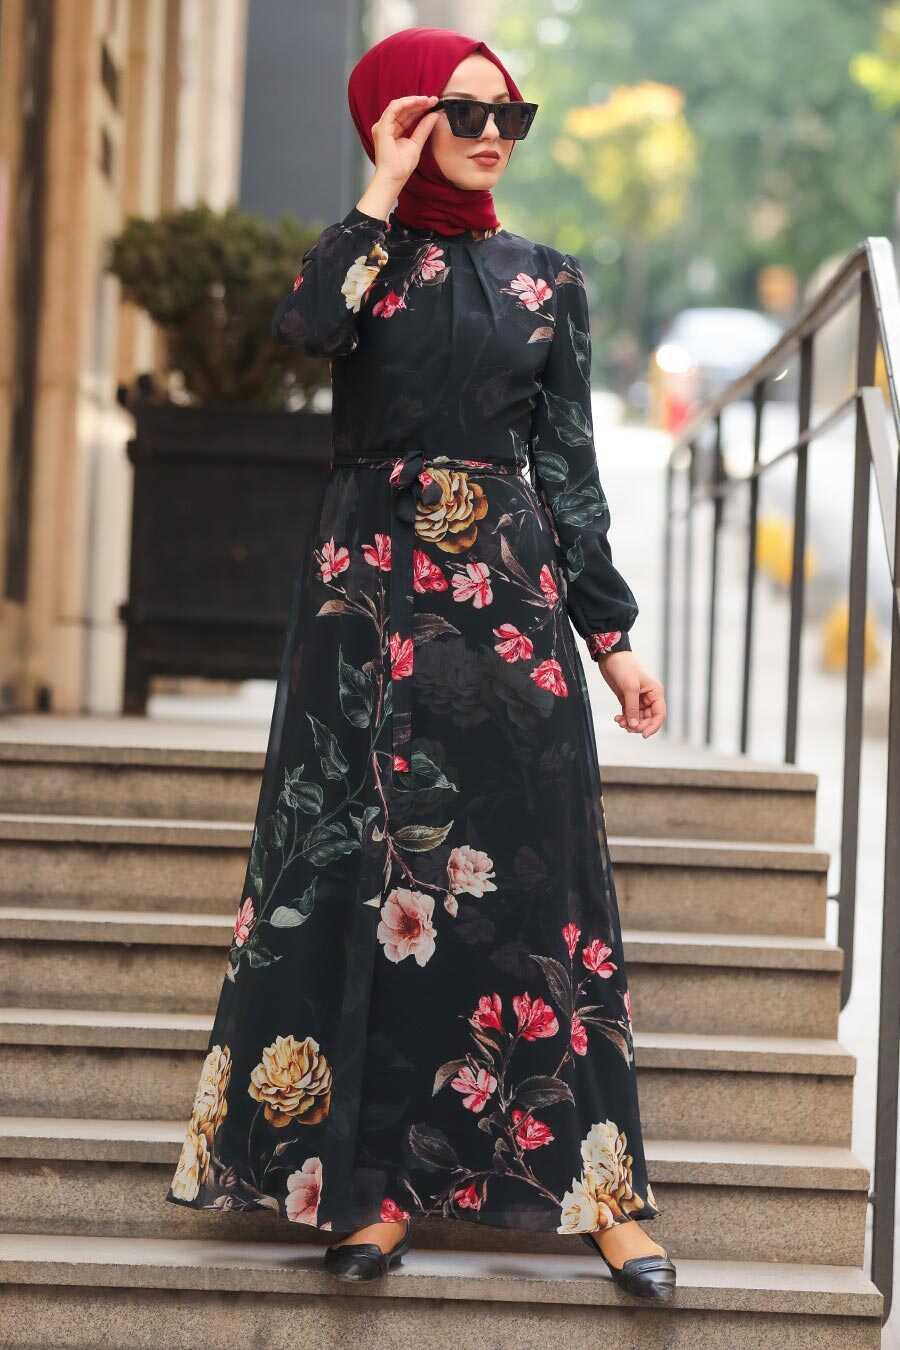 Black Hijab Daily Dress 8154S